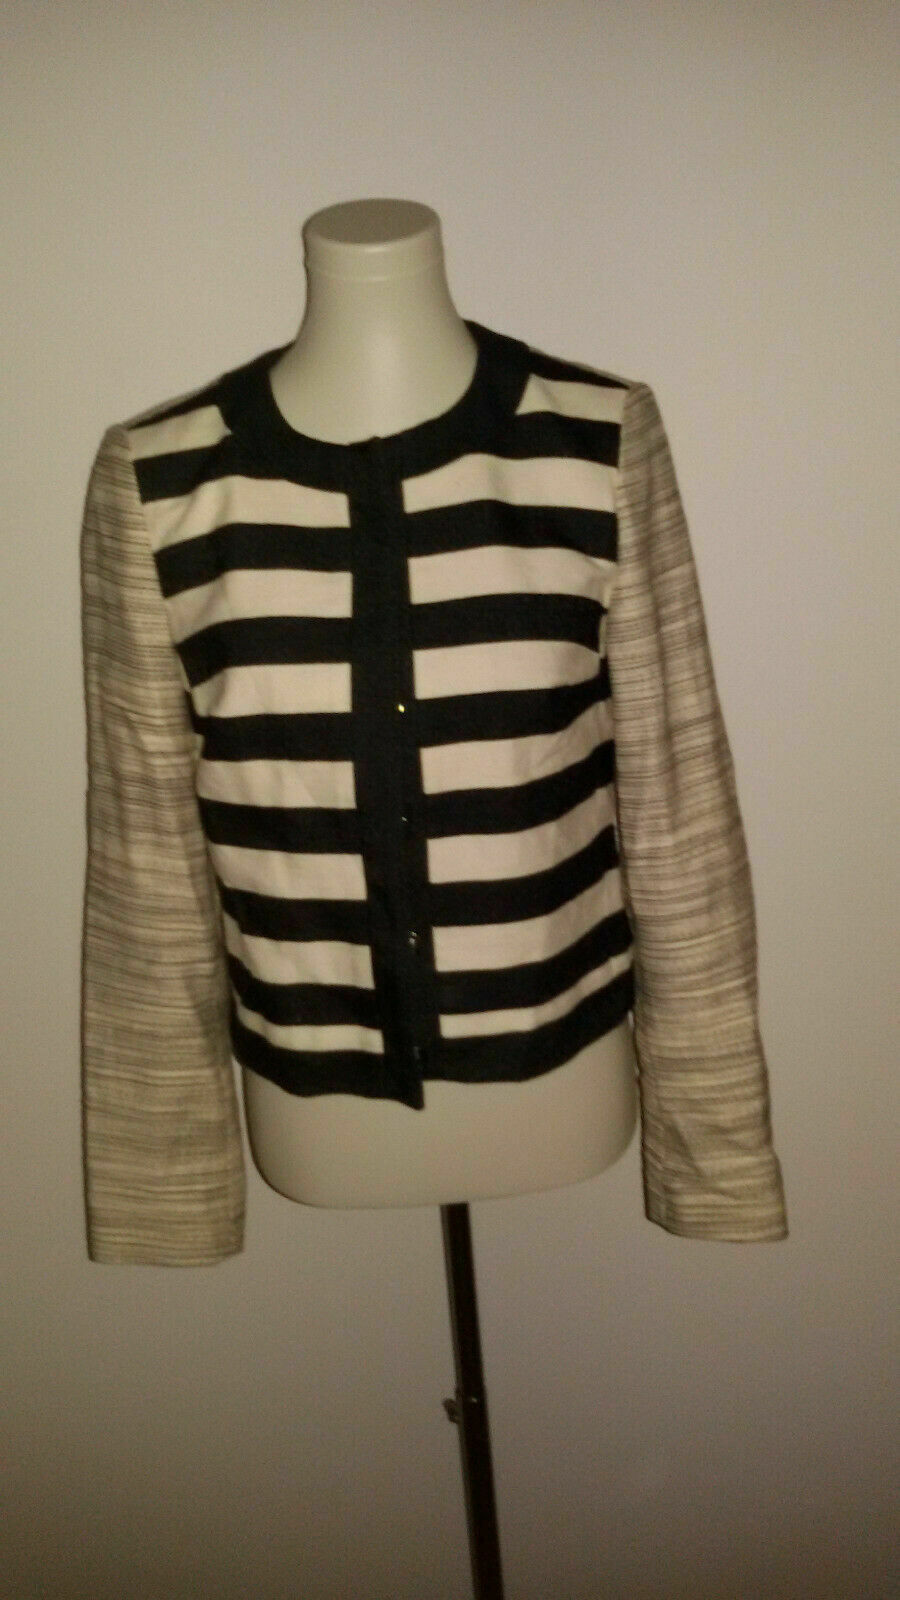 ESPRIT Stepp- Blazer ♡ Shirtjacke ♡ gesteppte Jacke ♡ Blazer Gr. 38 / M